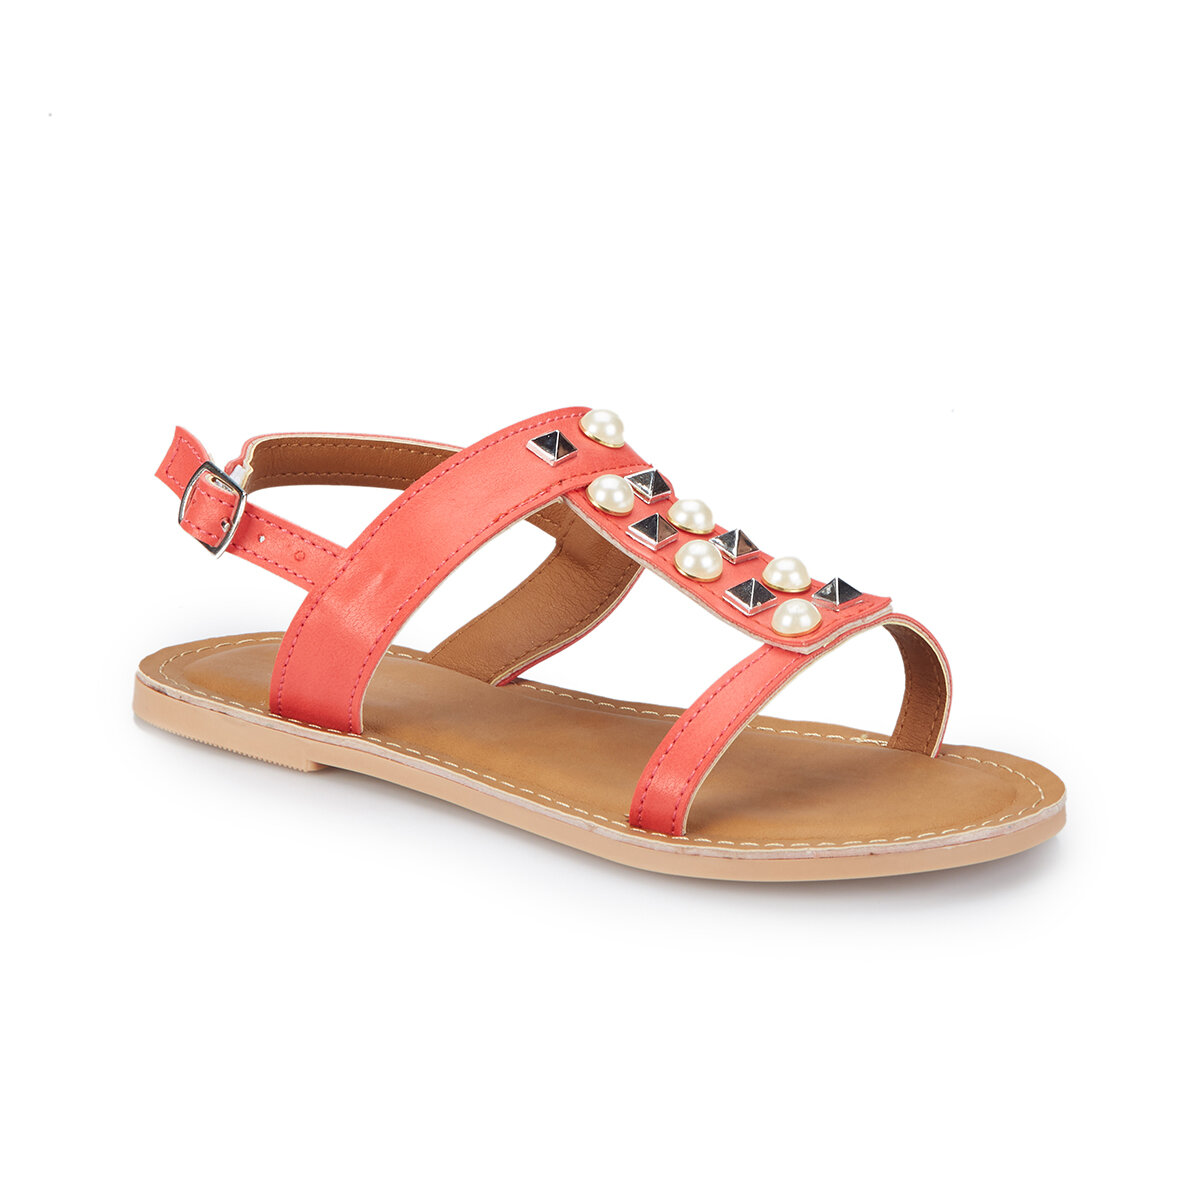 FLO SENUS Coral Female Child Sandals PINKSTEP